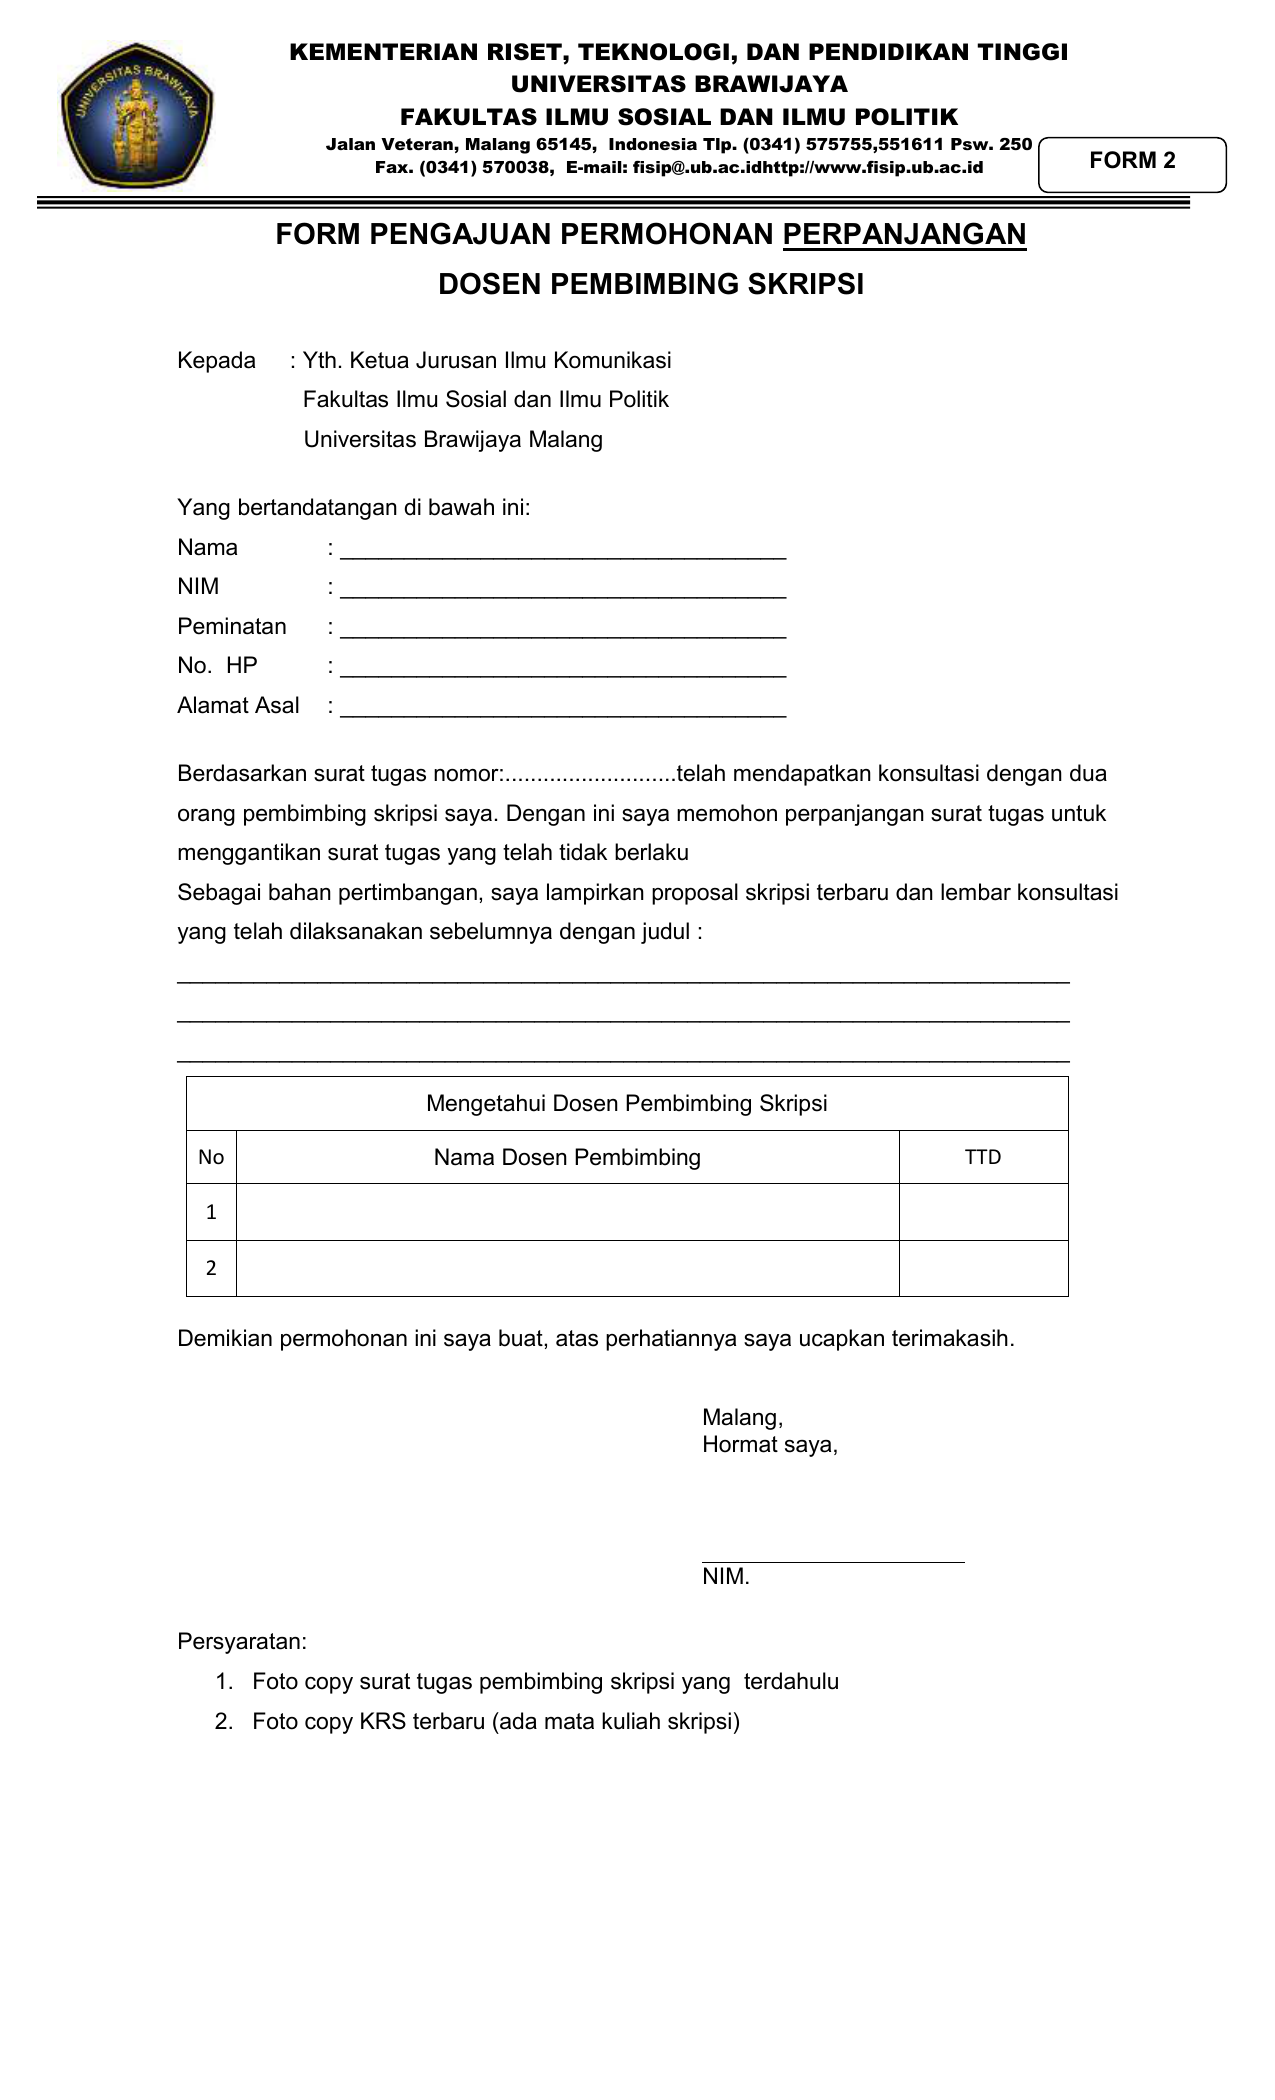 Surat Tugas Pembimbing Skripsi Psikologi Ub